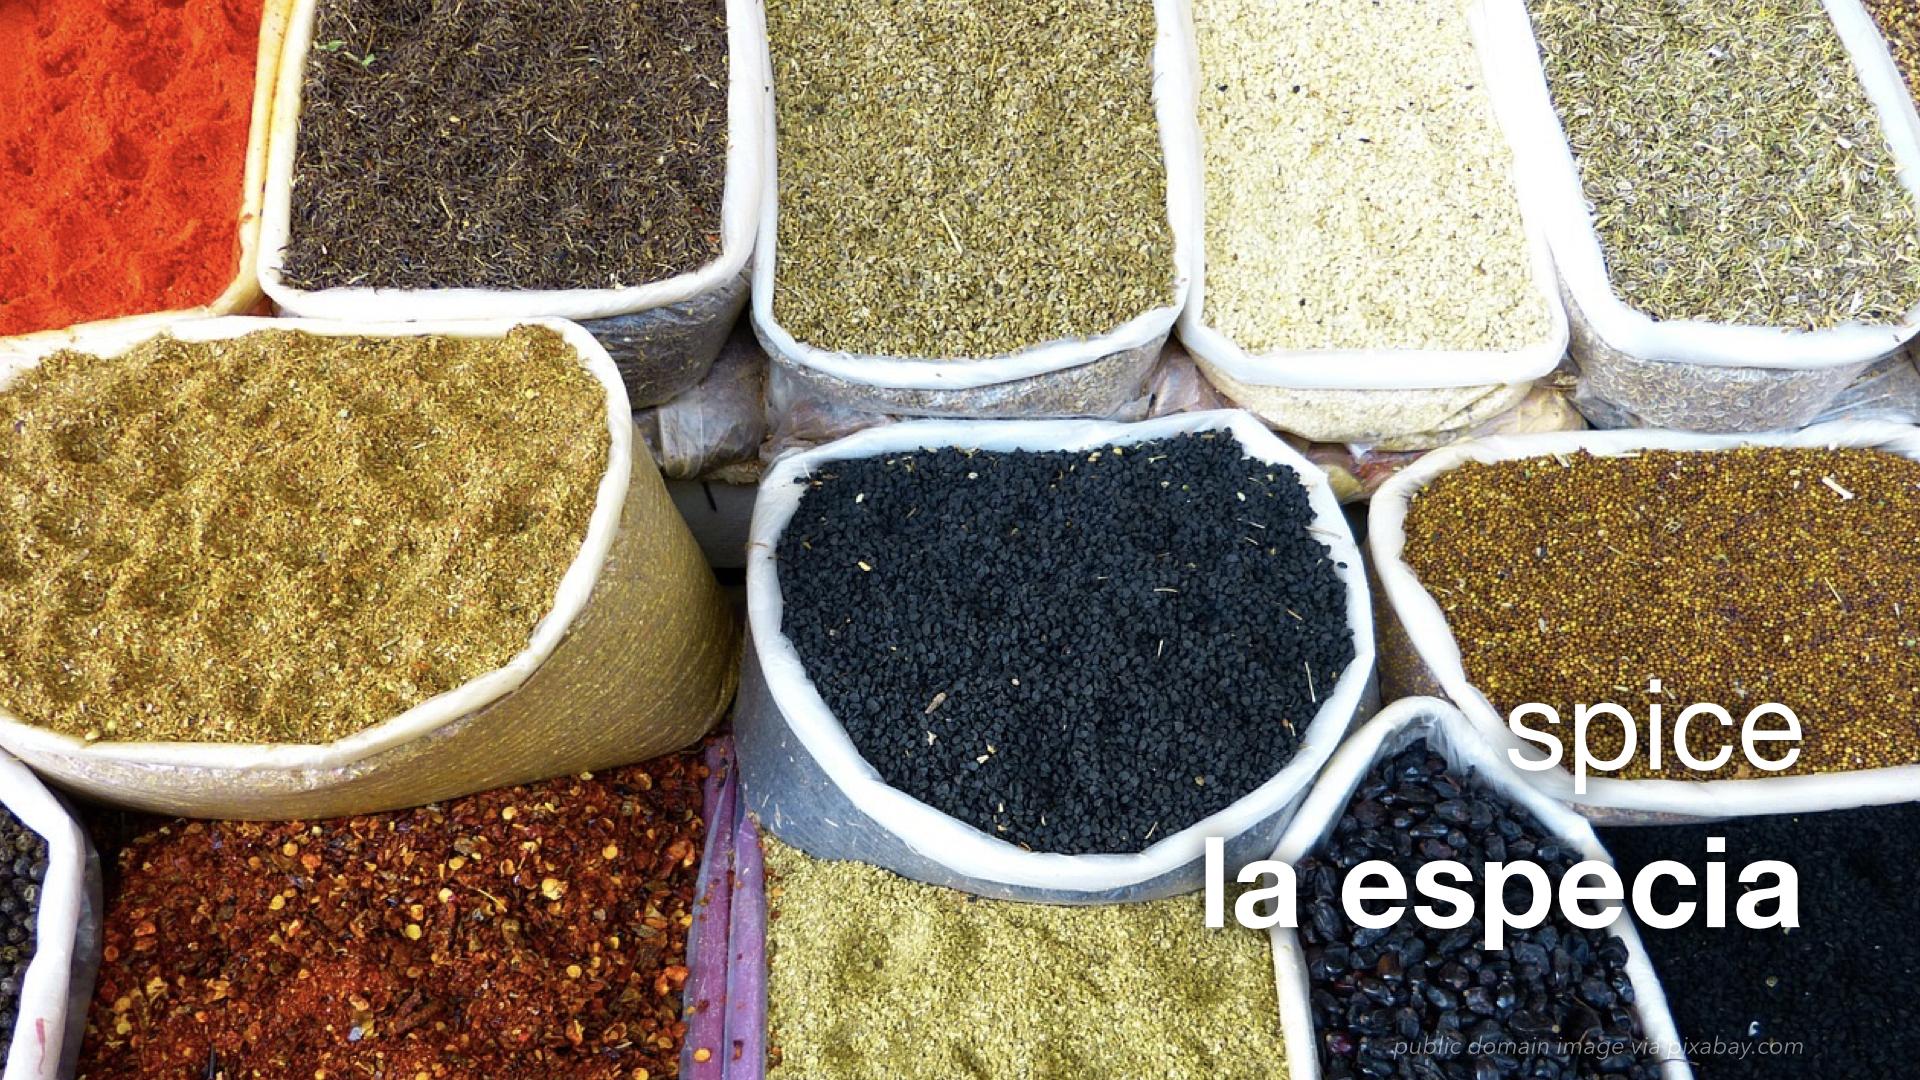 leaf spanish flash – hospitality – the market.010 : the leaf project